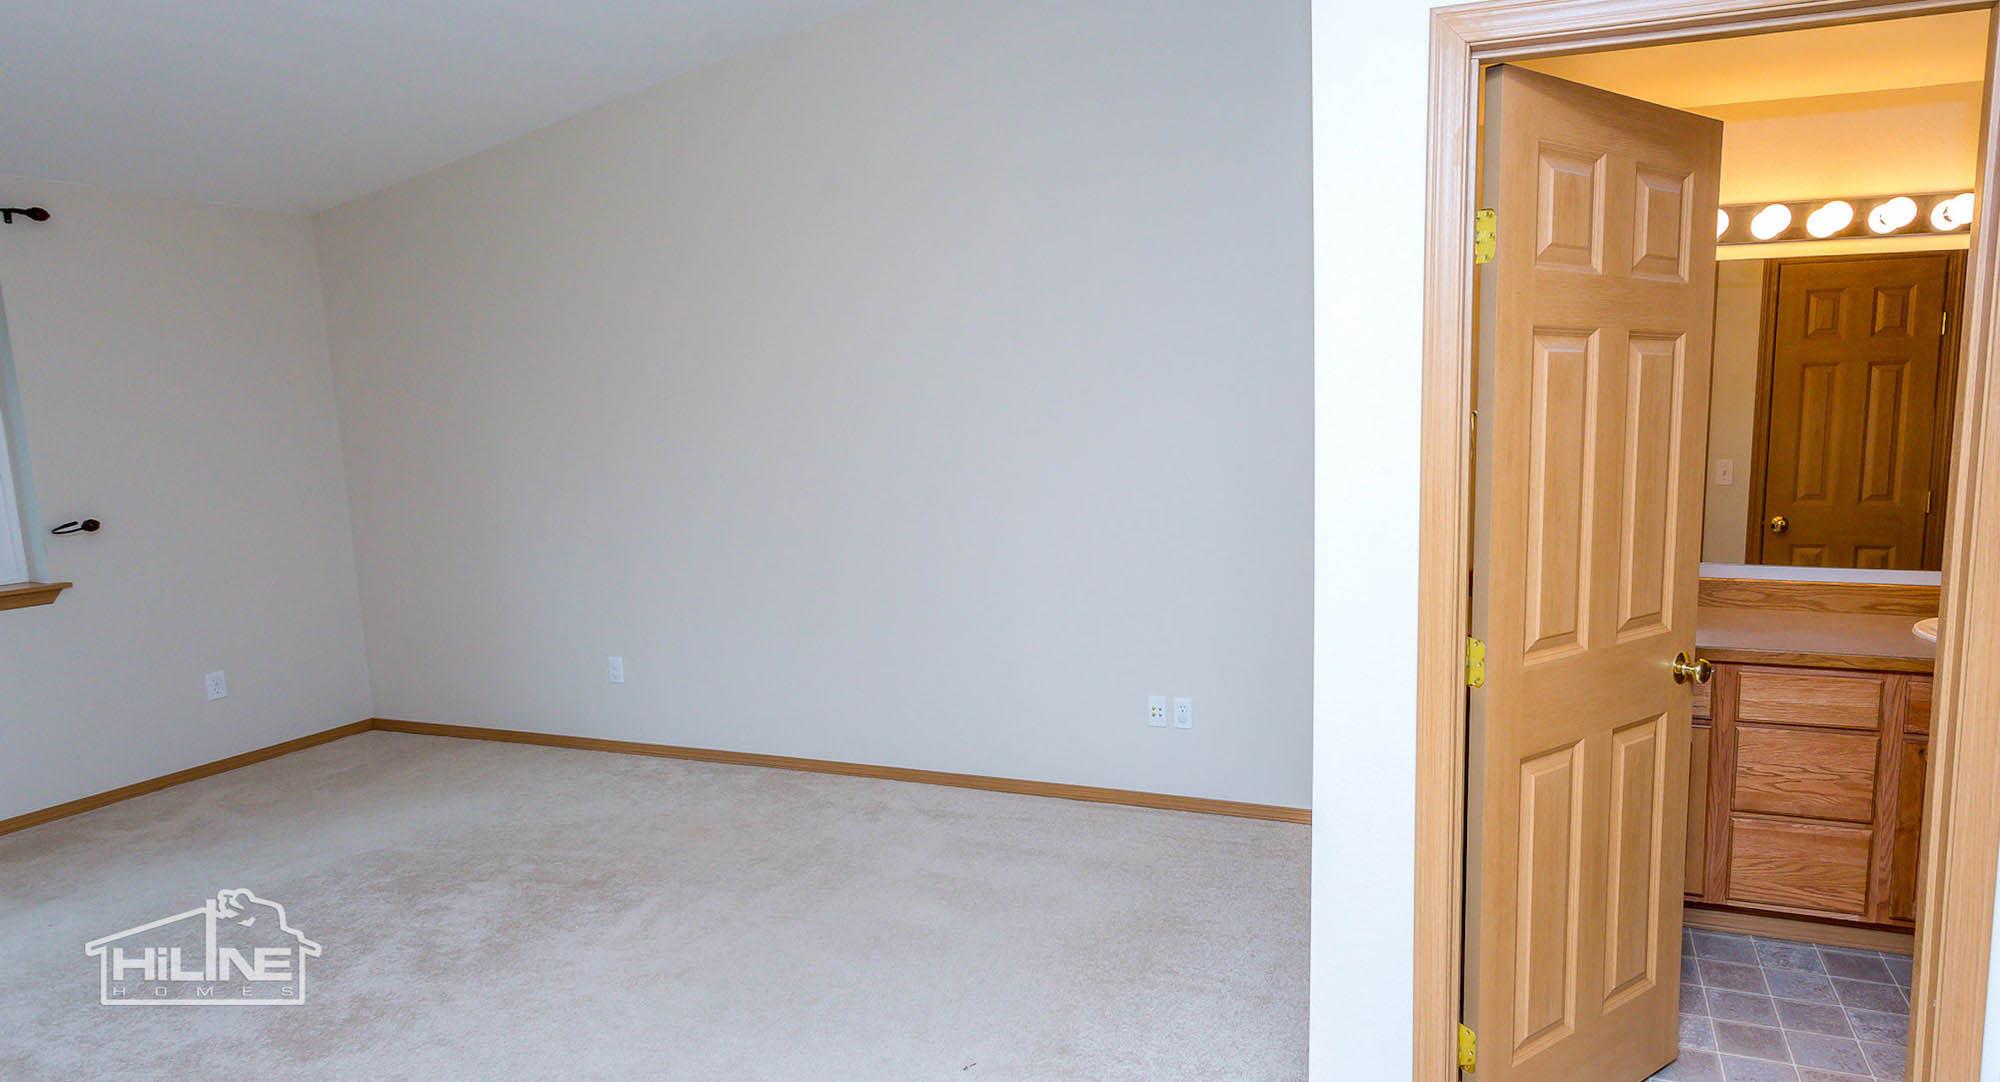 HiLine Home Plan 2345 Master Suite